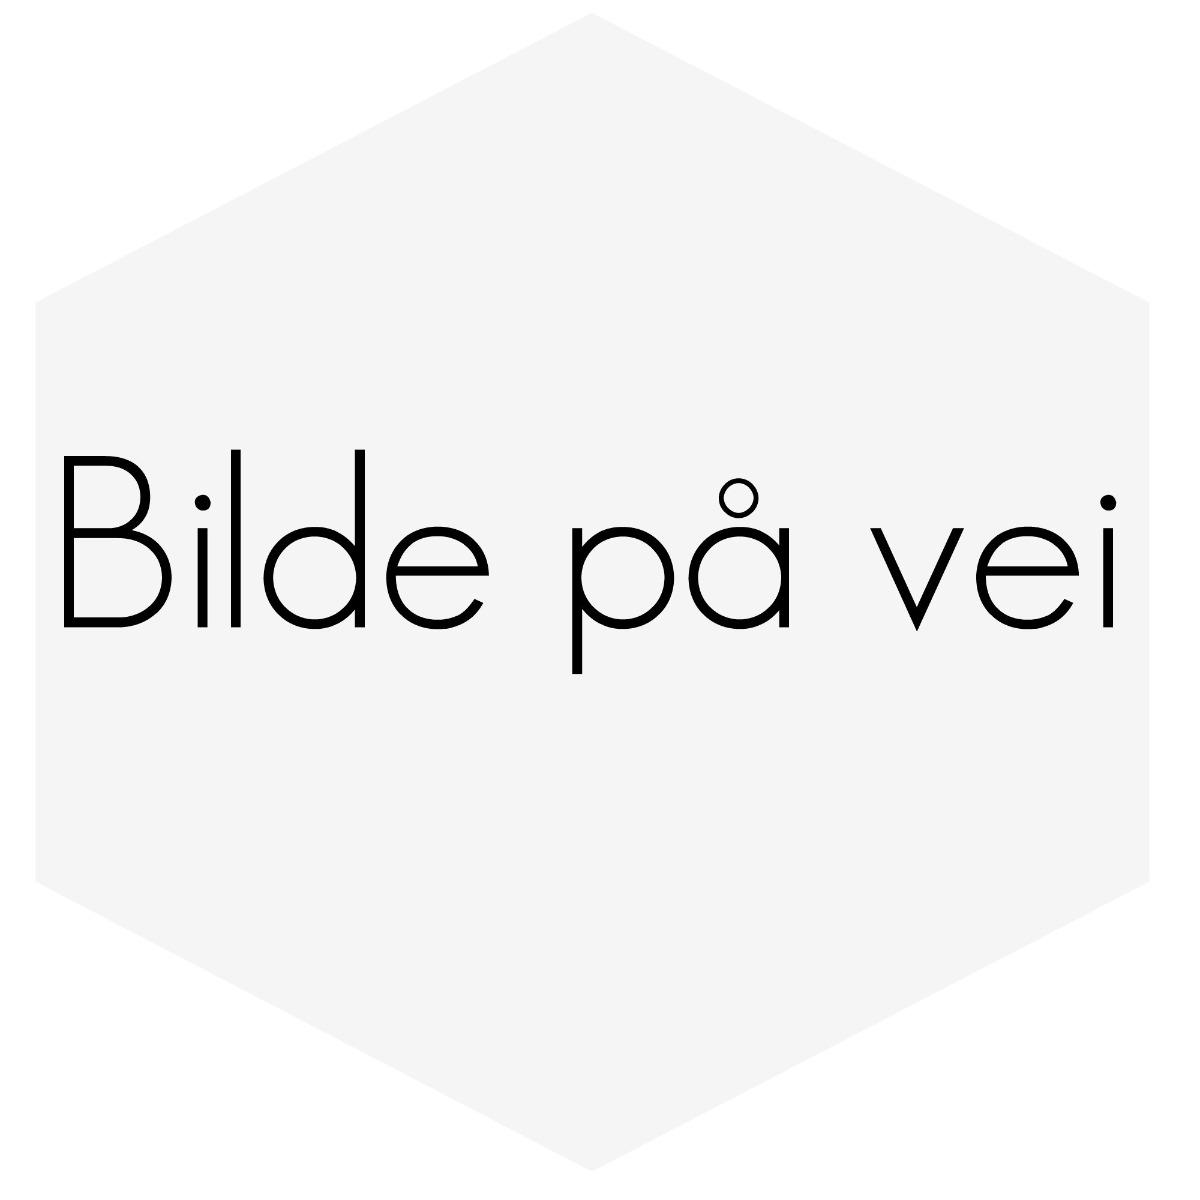 STØTFANGERPLAST FORAN VOLVO V70 01-2004 9484443